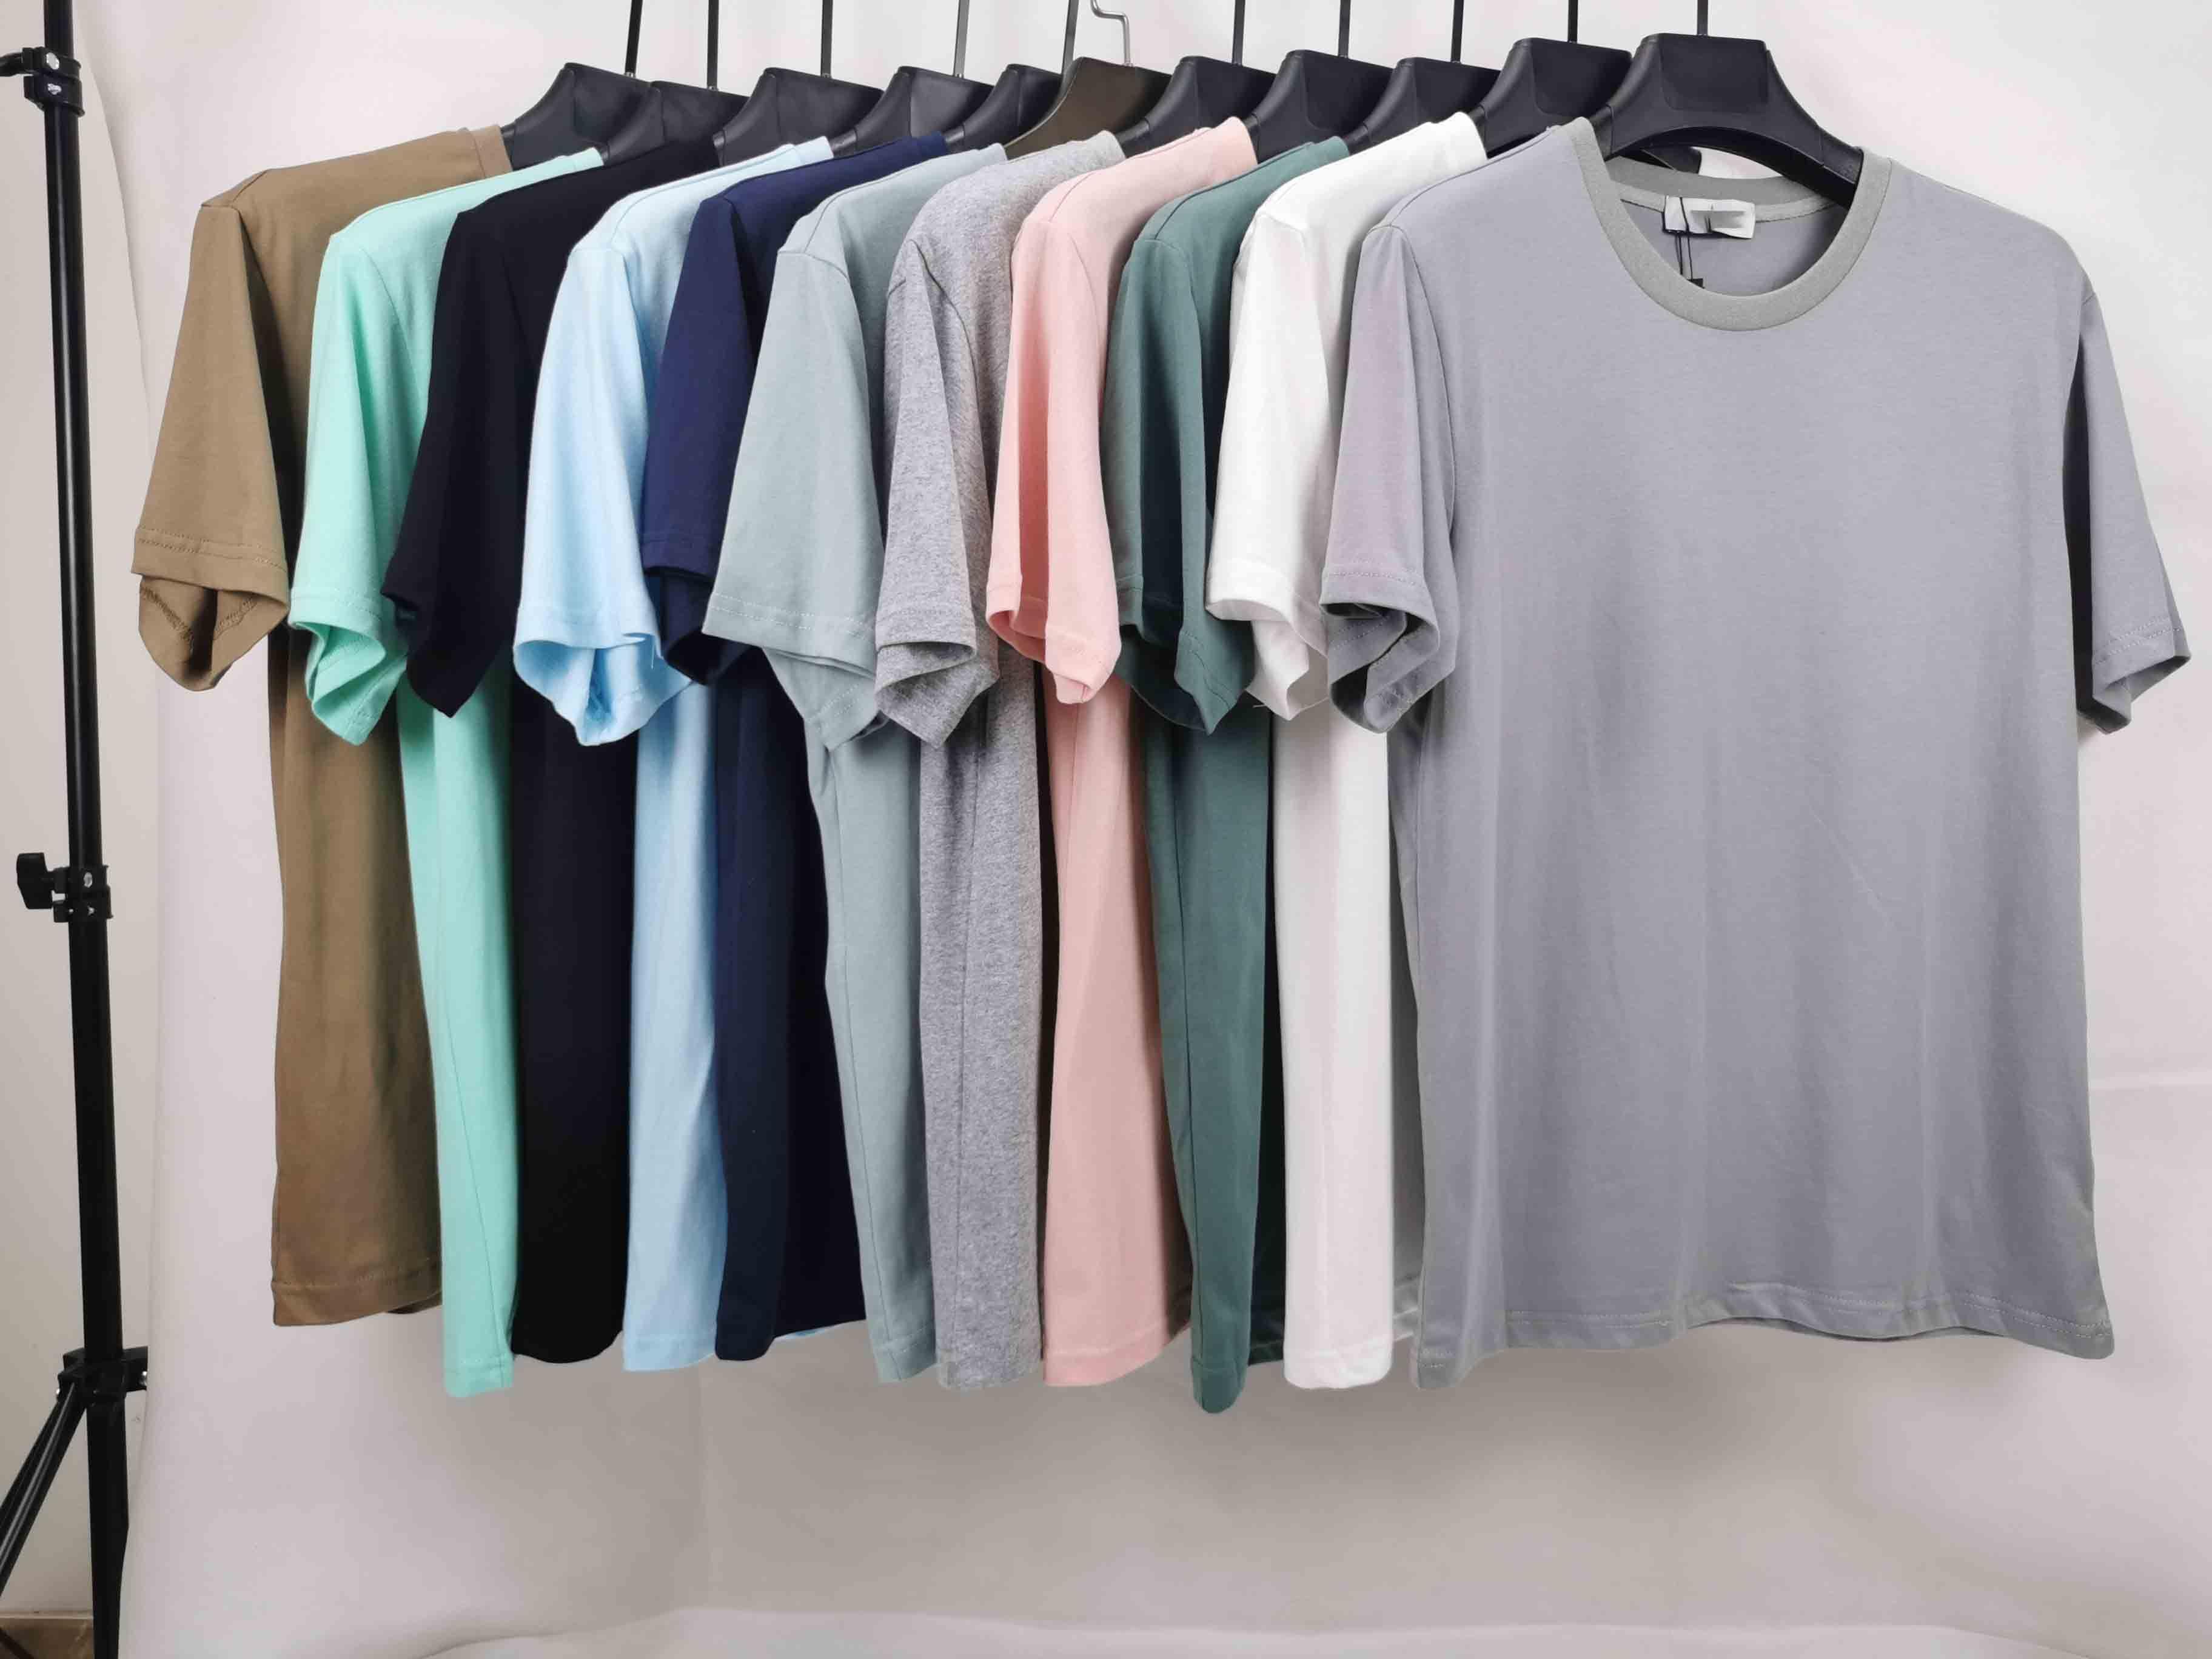 Mens Designer T Shirts Men T-shirt Women Clothing Summer Casual Crew Neck Modal Short Sleeve High Quality Fashion Shirt for Male Size M-2XL